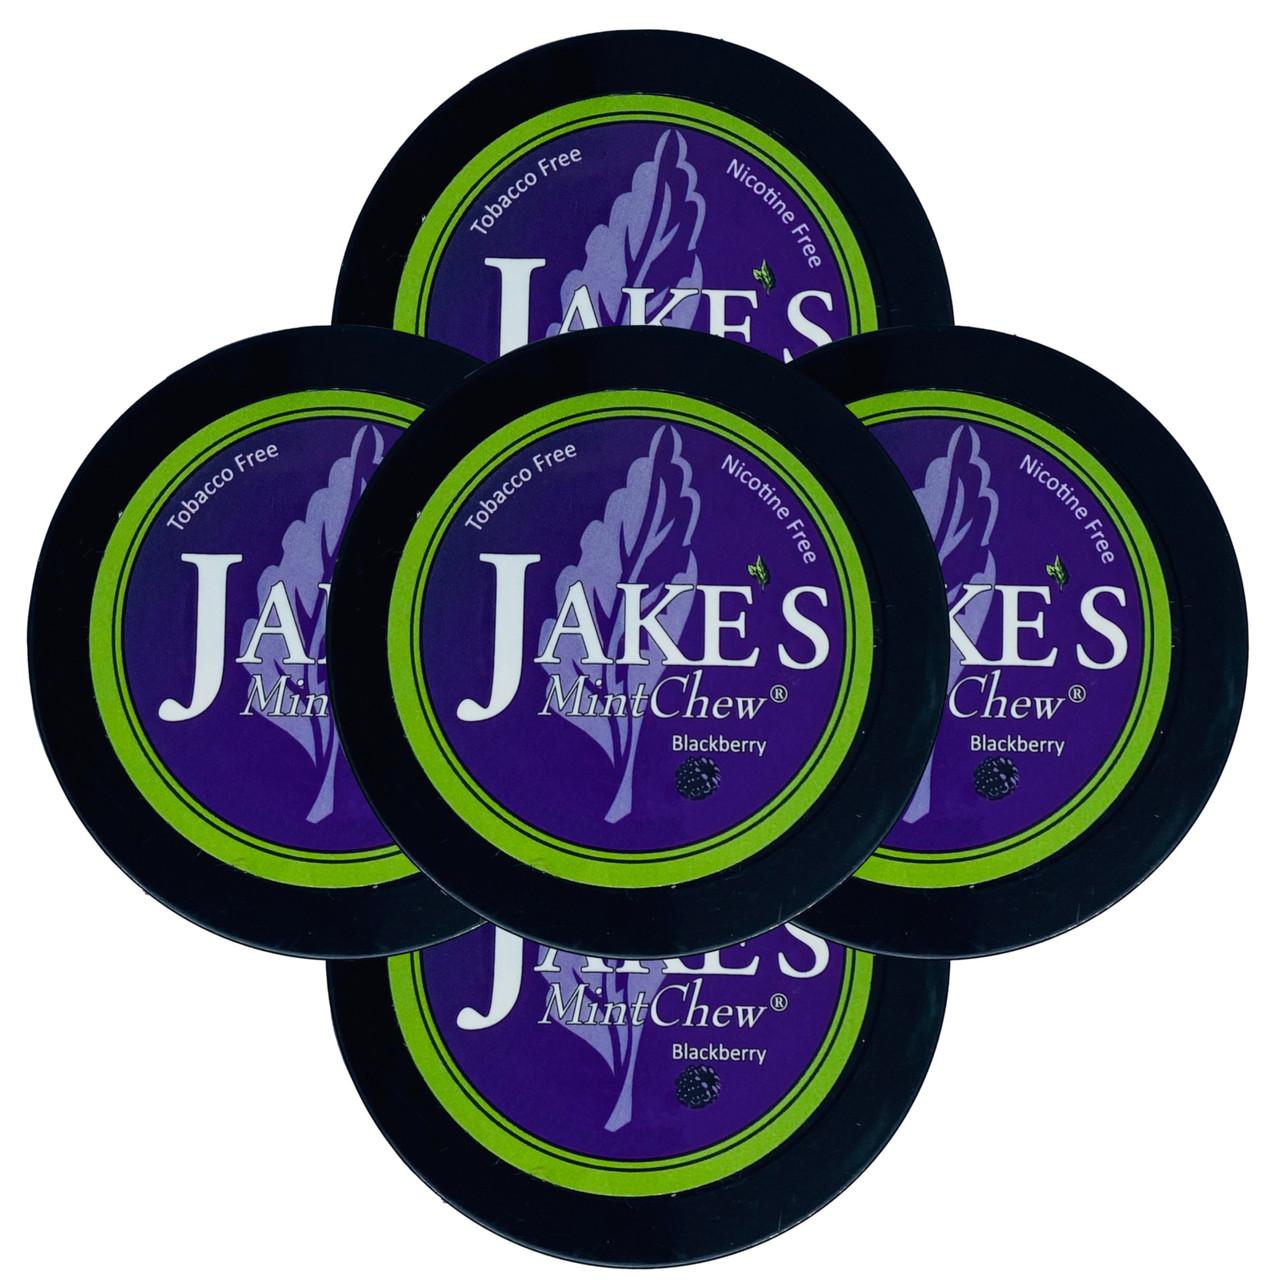 Jake's Mint Herbal Chew Blackberry 5 Cans